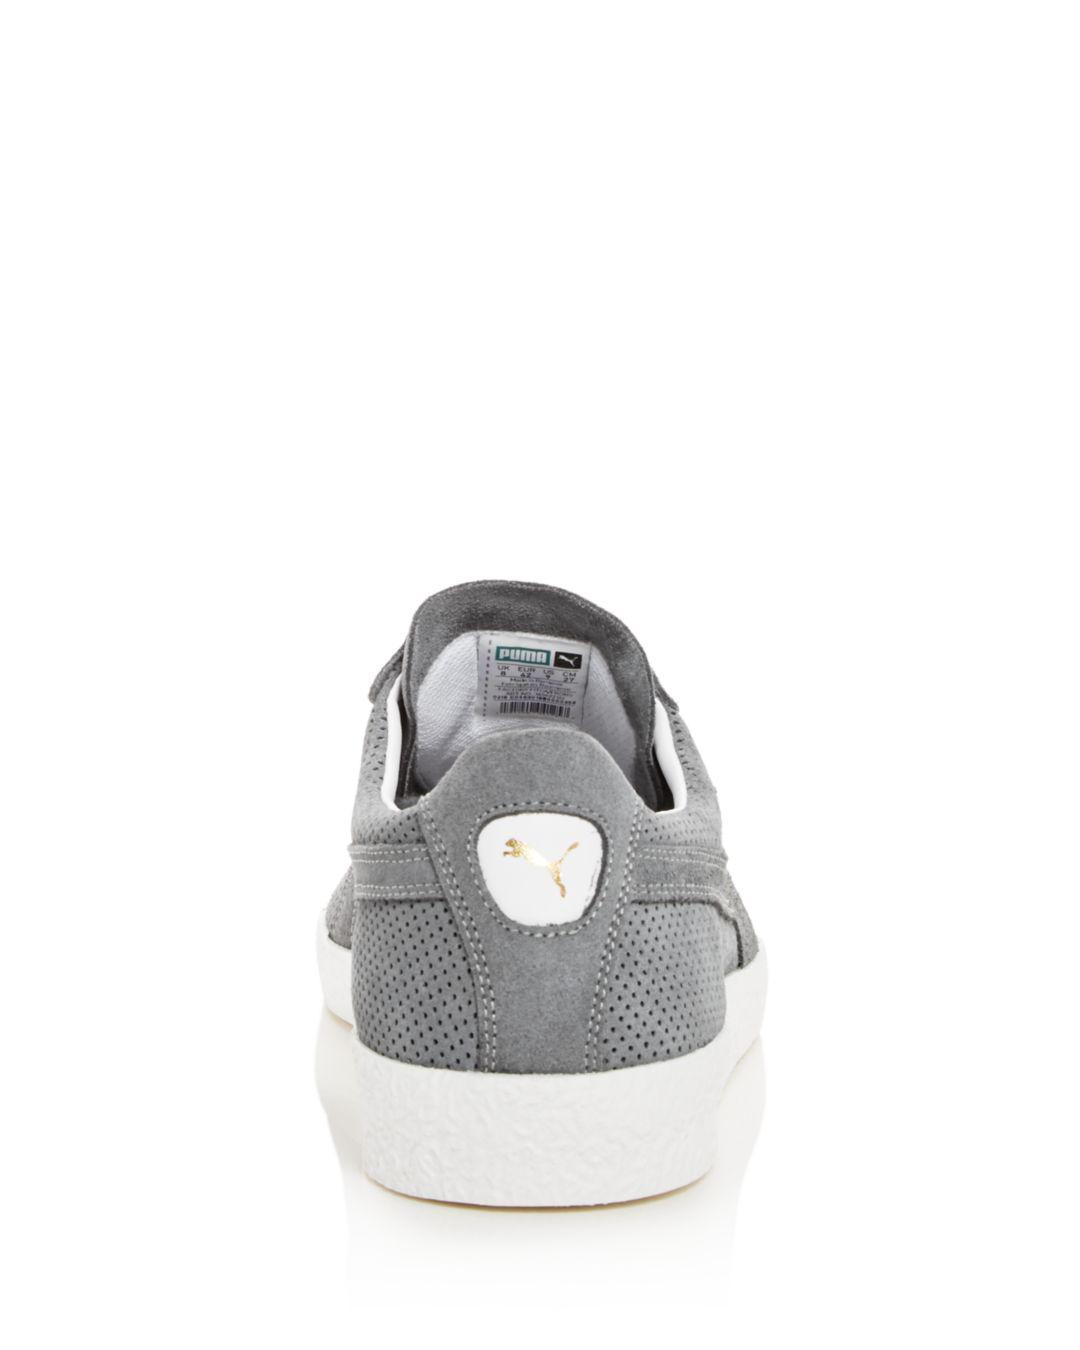 7ddc412b04b PUMA - Gray Men s Te-ku Summer Perforated Suede Lace Up Sneakers for Men -.  View fullscreen